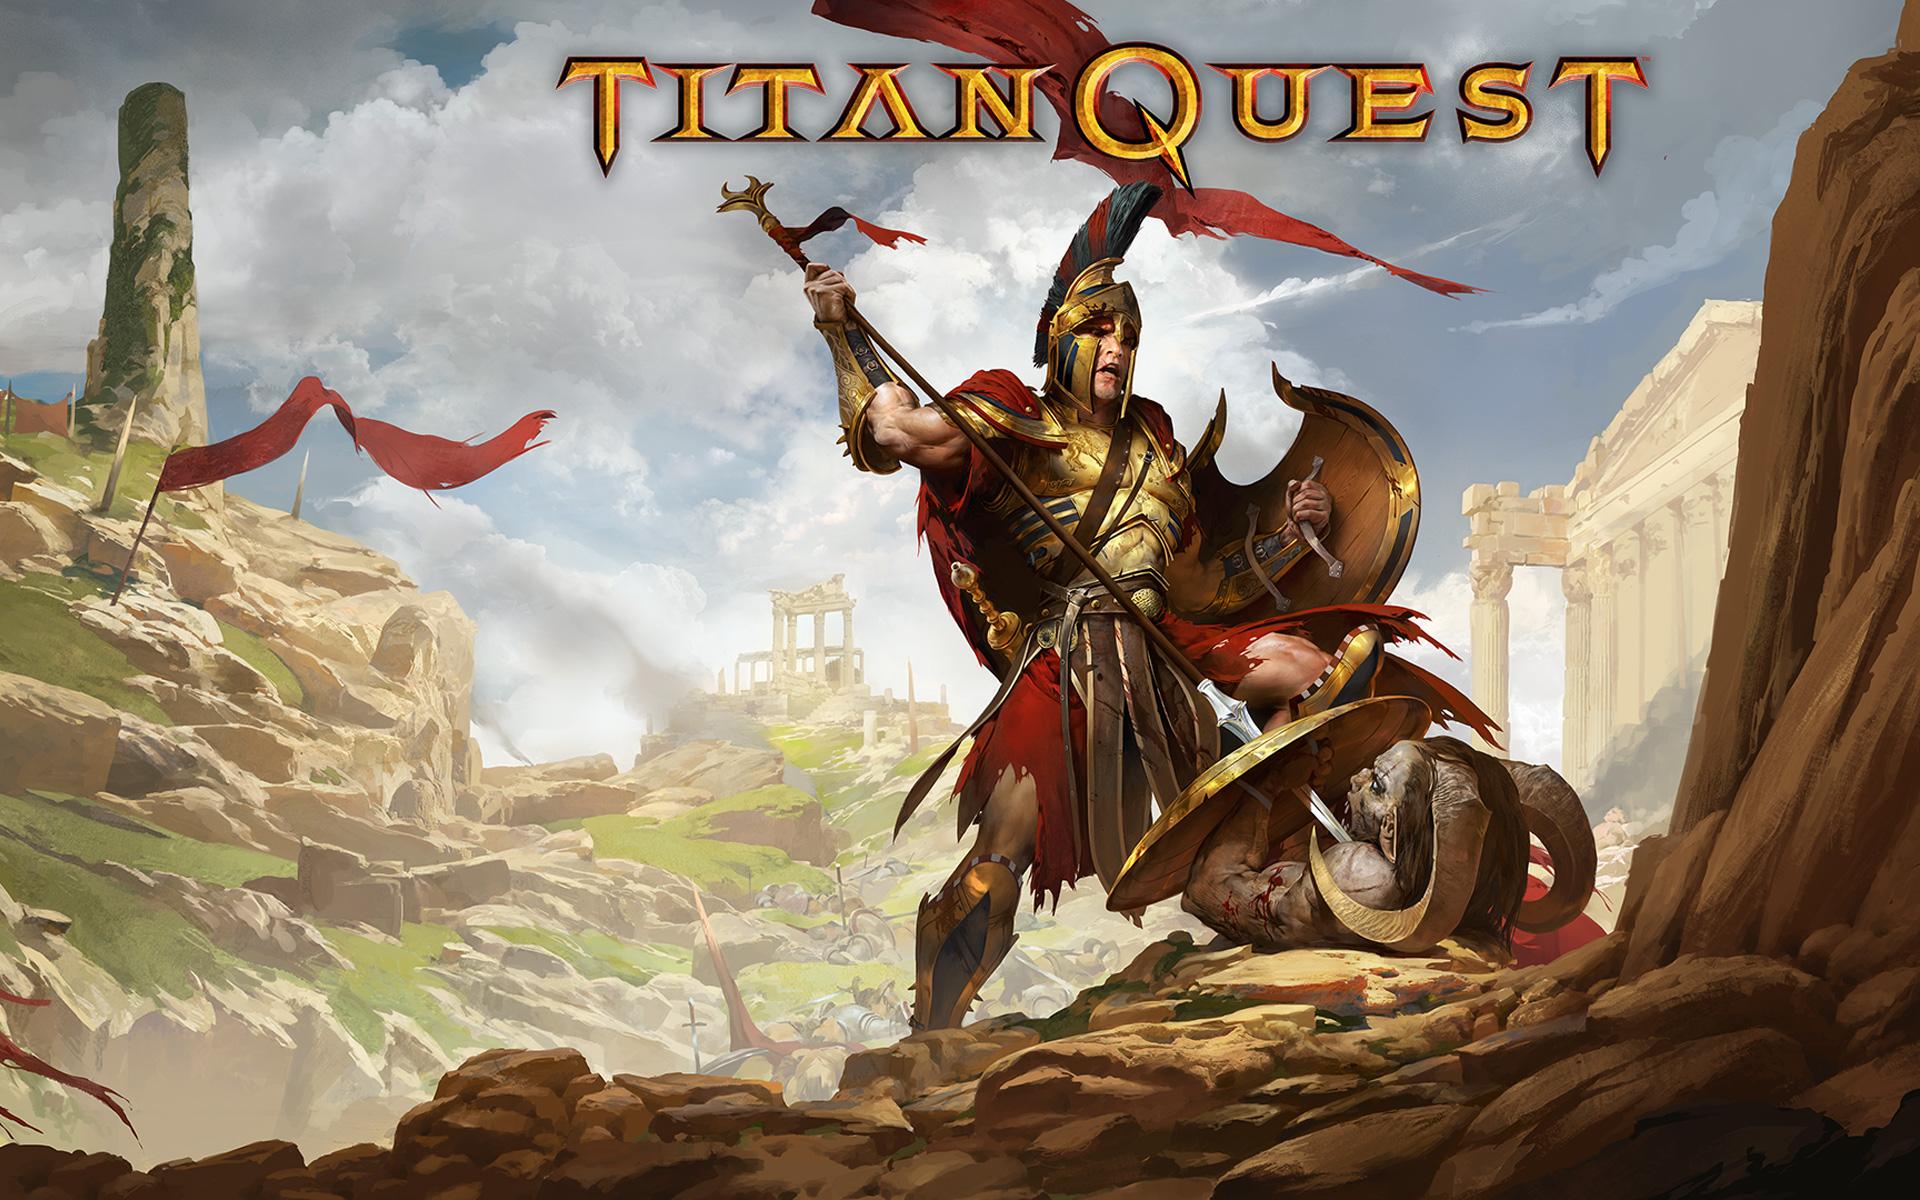 Titan Quest Wallpaper in 1920x1200